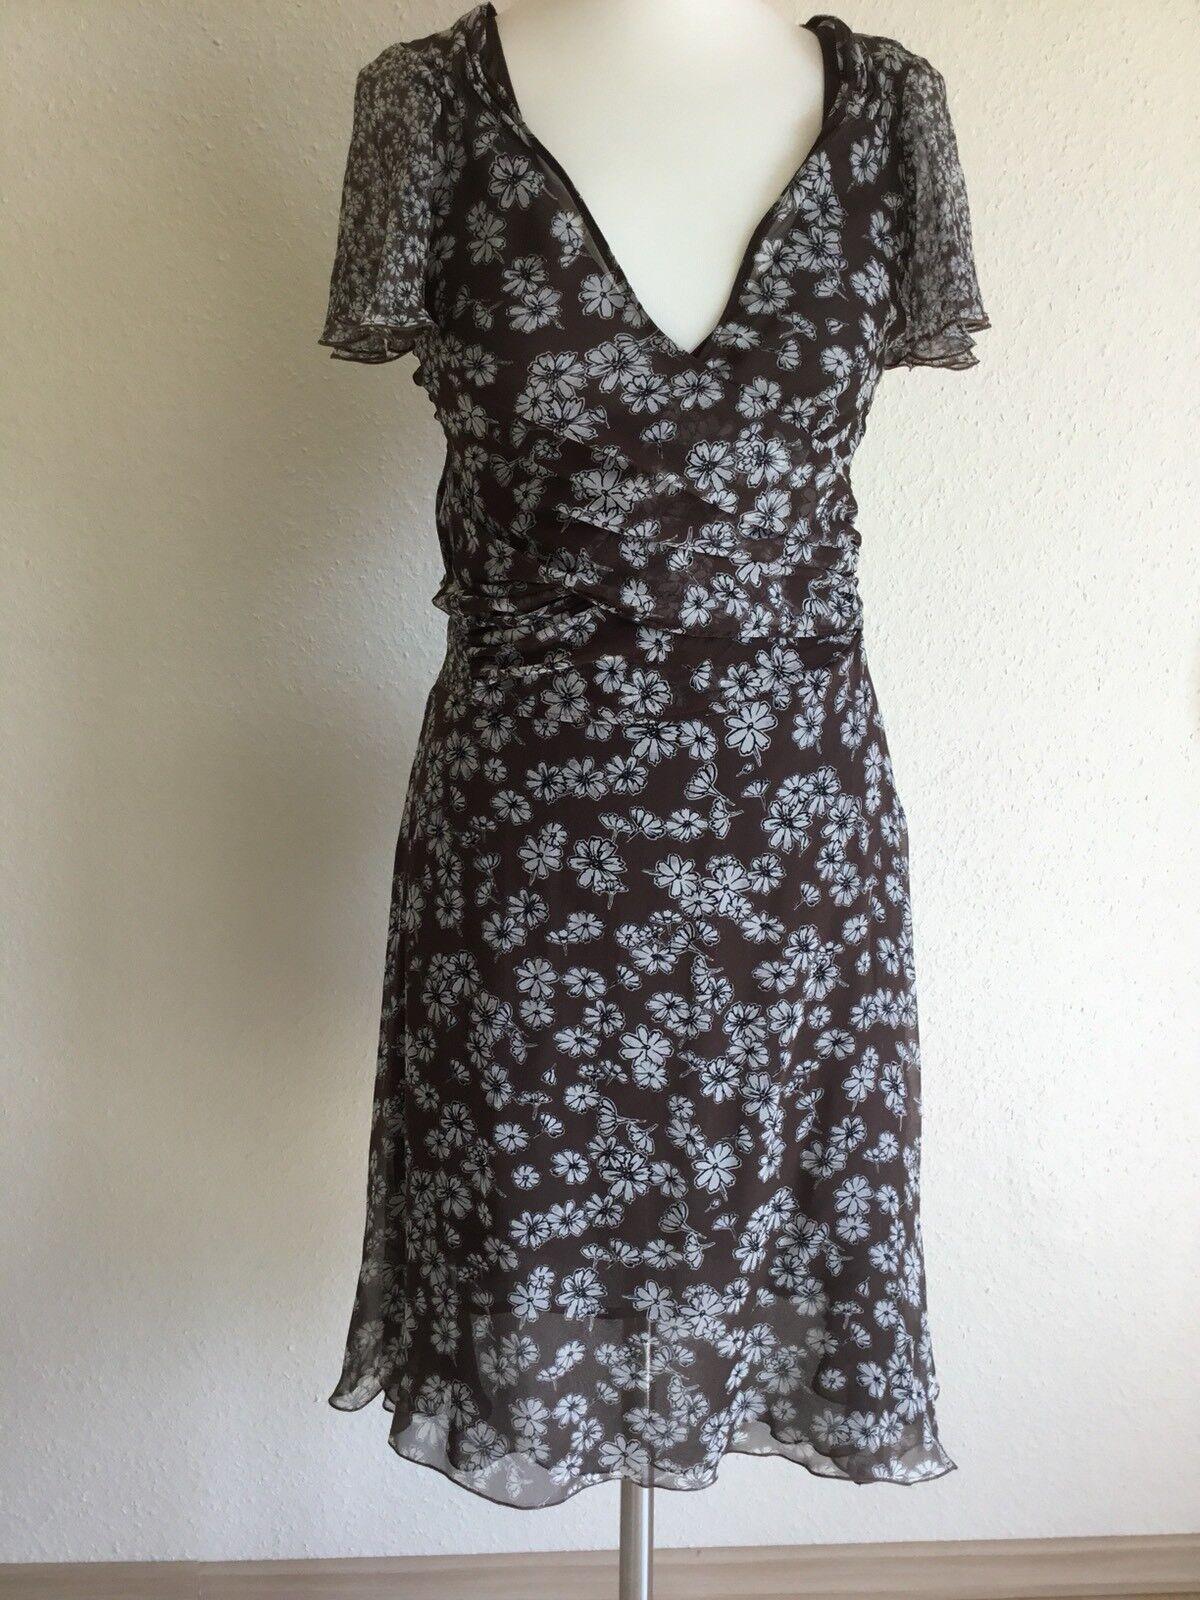 MARC CAIN Kleid aus Seide, Größe 38 N3,braun geblümt, NEU